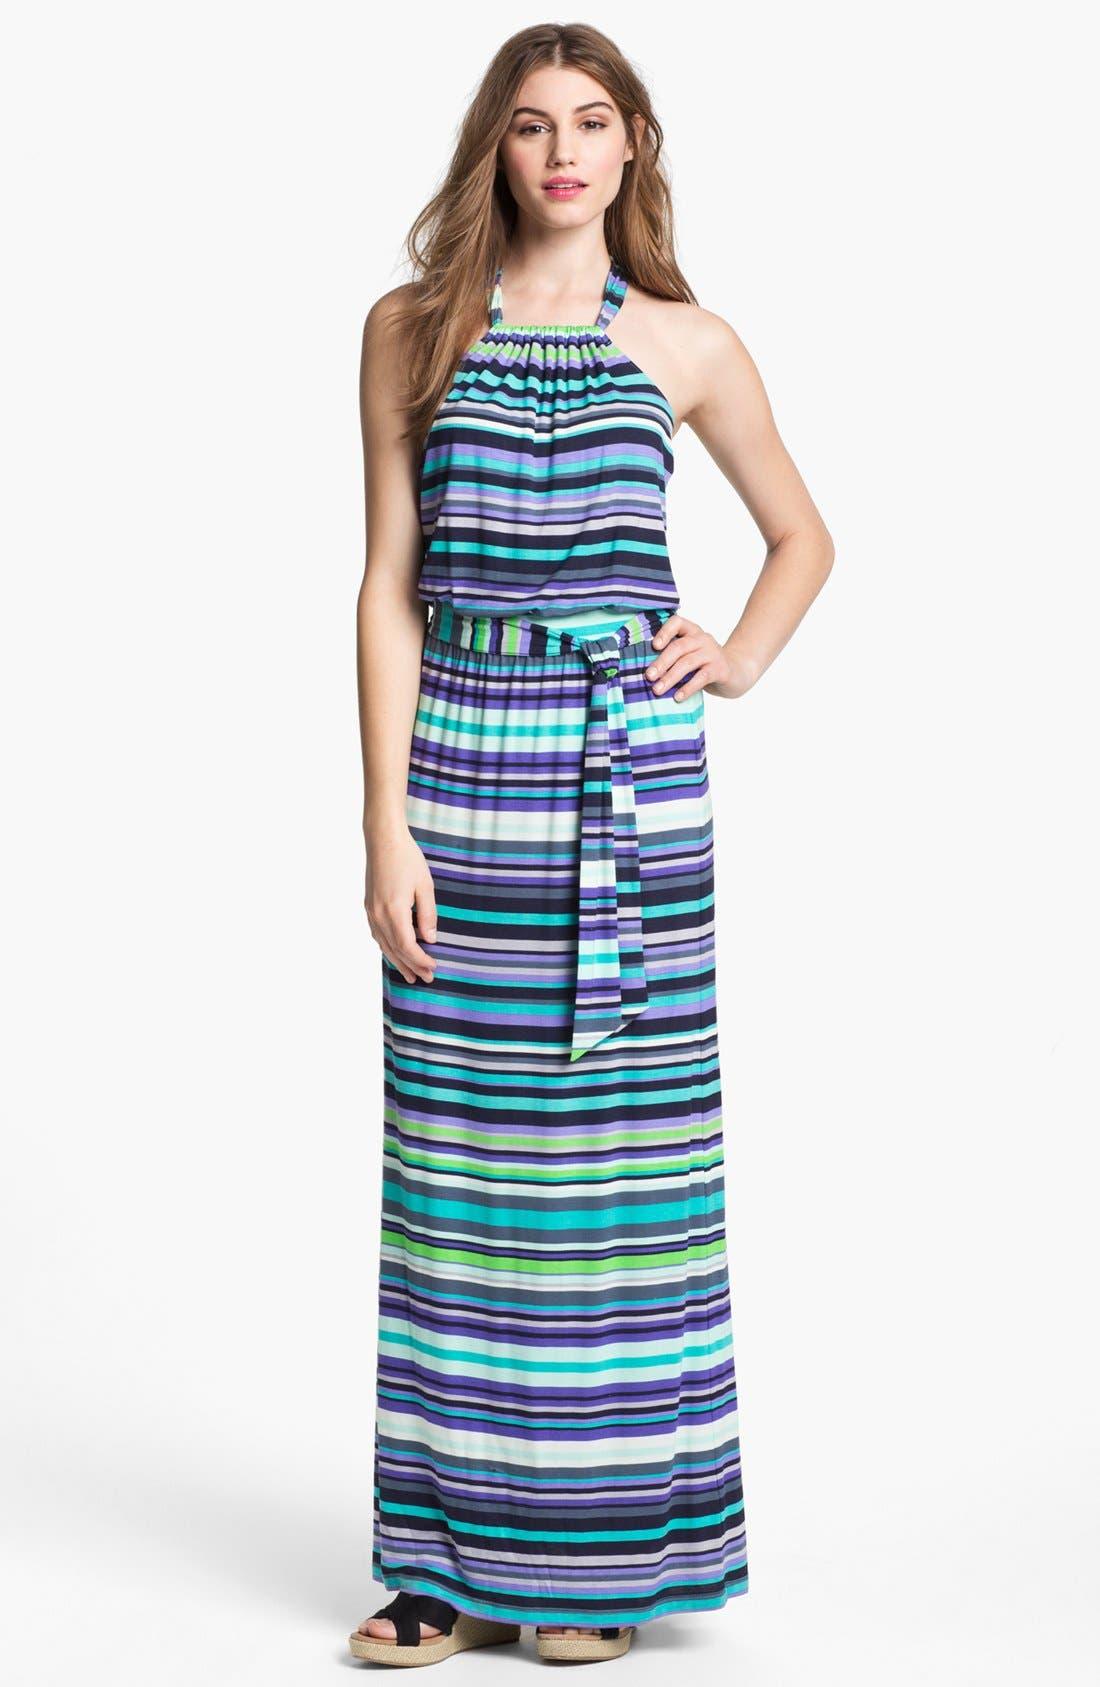 Alternate Image 1 Selected - Caslon® Halter Knit Maxi Dress (Petite)